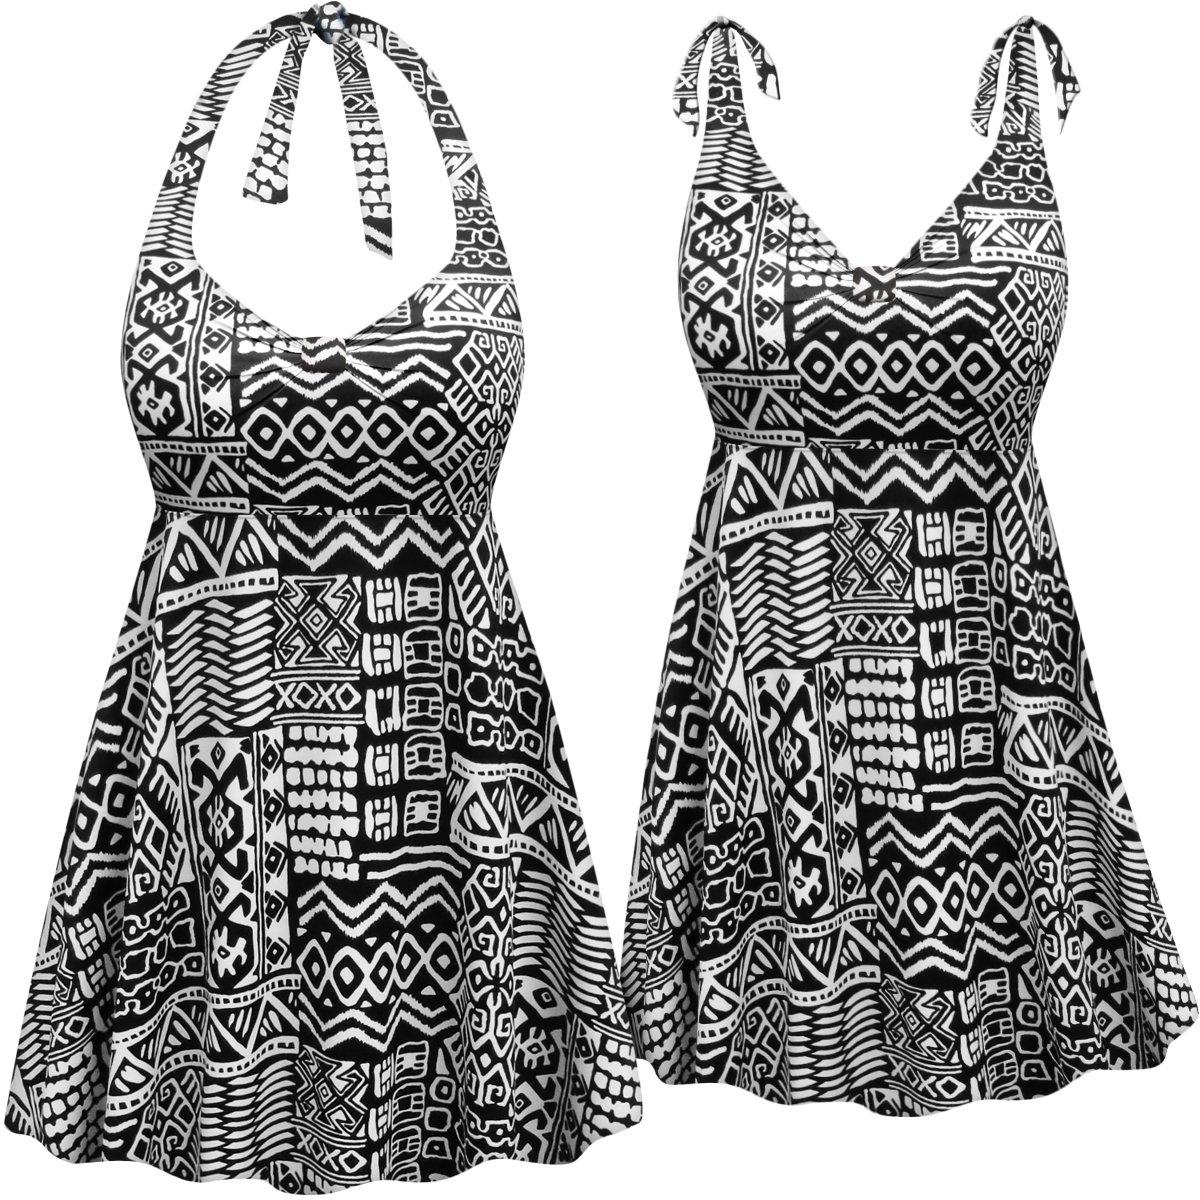 4646385794999 Available as either halter or shoulder strap 2pc swimsuit/swimdress in size  0x 1x 2x 3x 4x 5x 6x 7x 8x & 9x. https://sanctuarie.com/swim30185.html ...